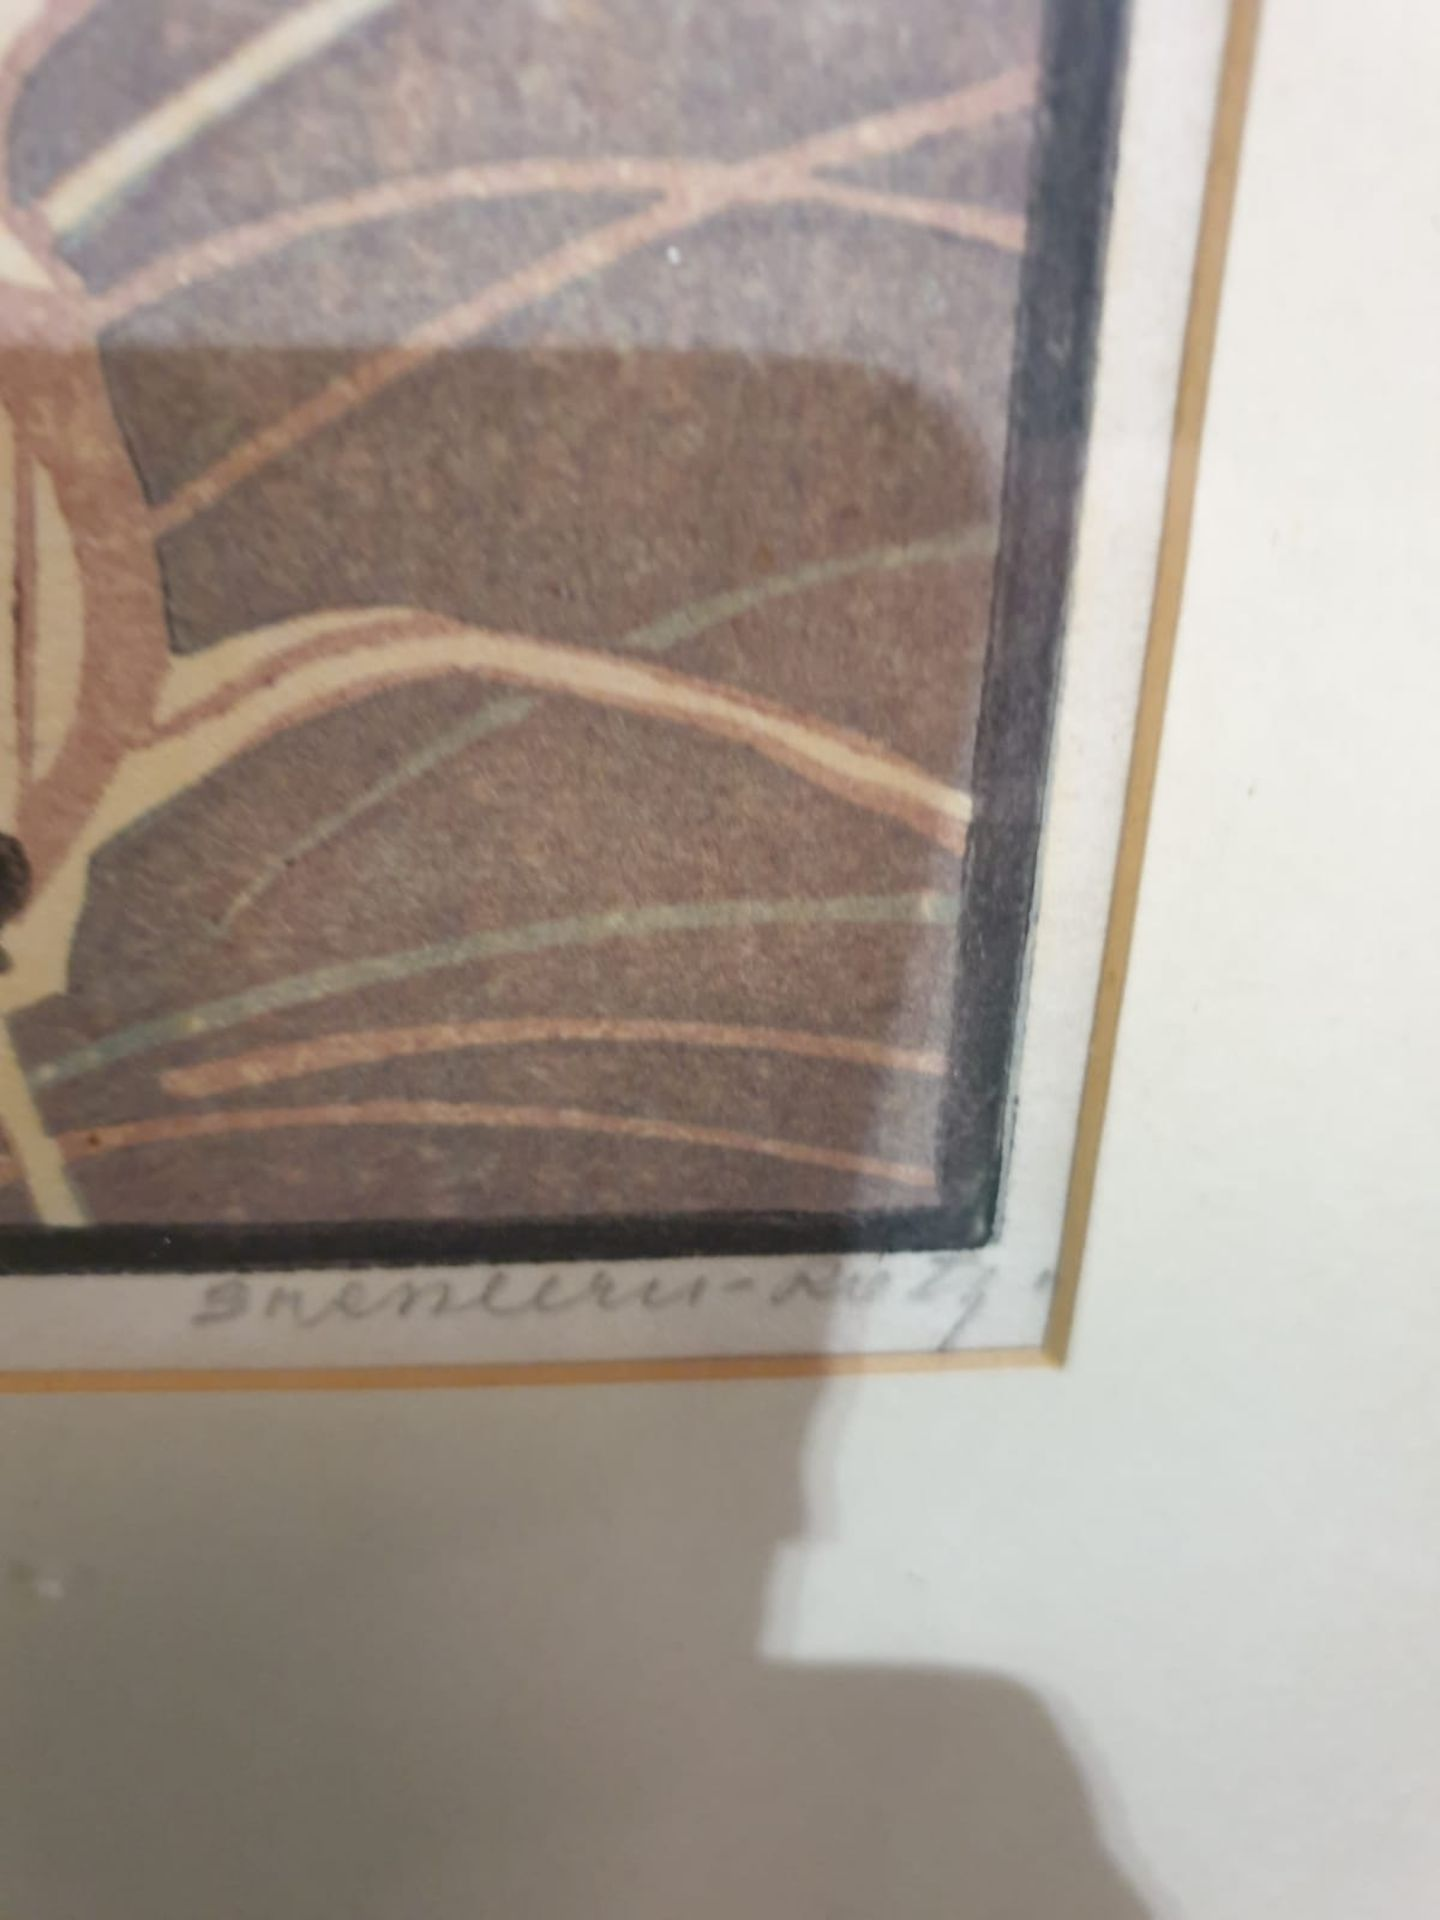 Line cut print multiple by Von Bresslern - Roth 1891-1978 tiger chasing Gazelles c. Circa 1920 - Image 4 of 6